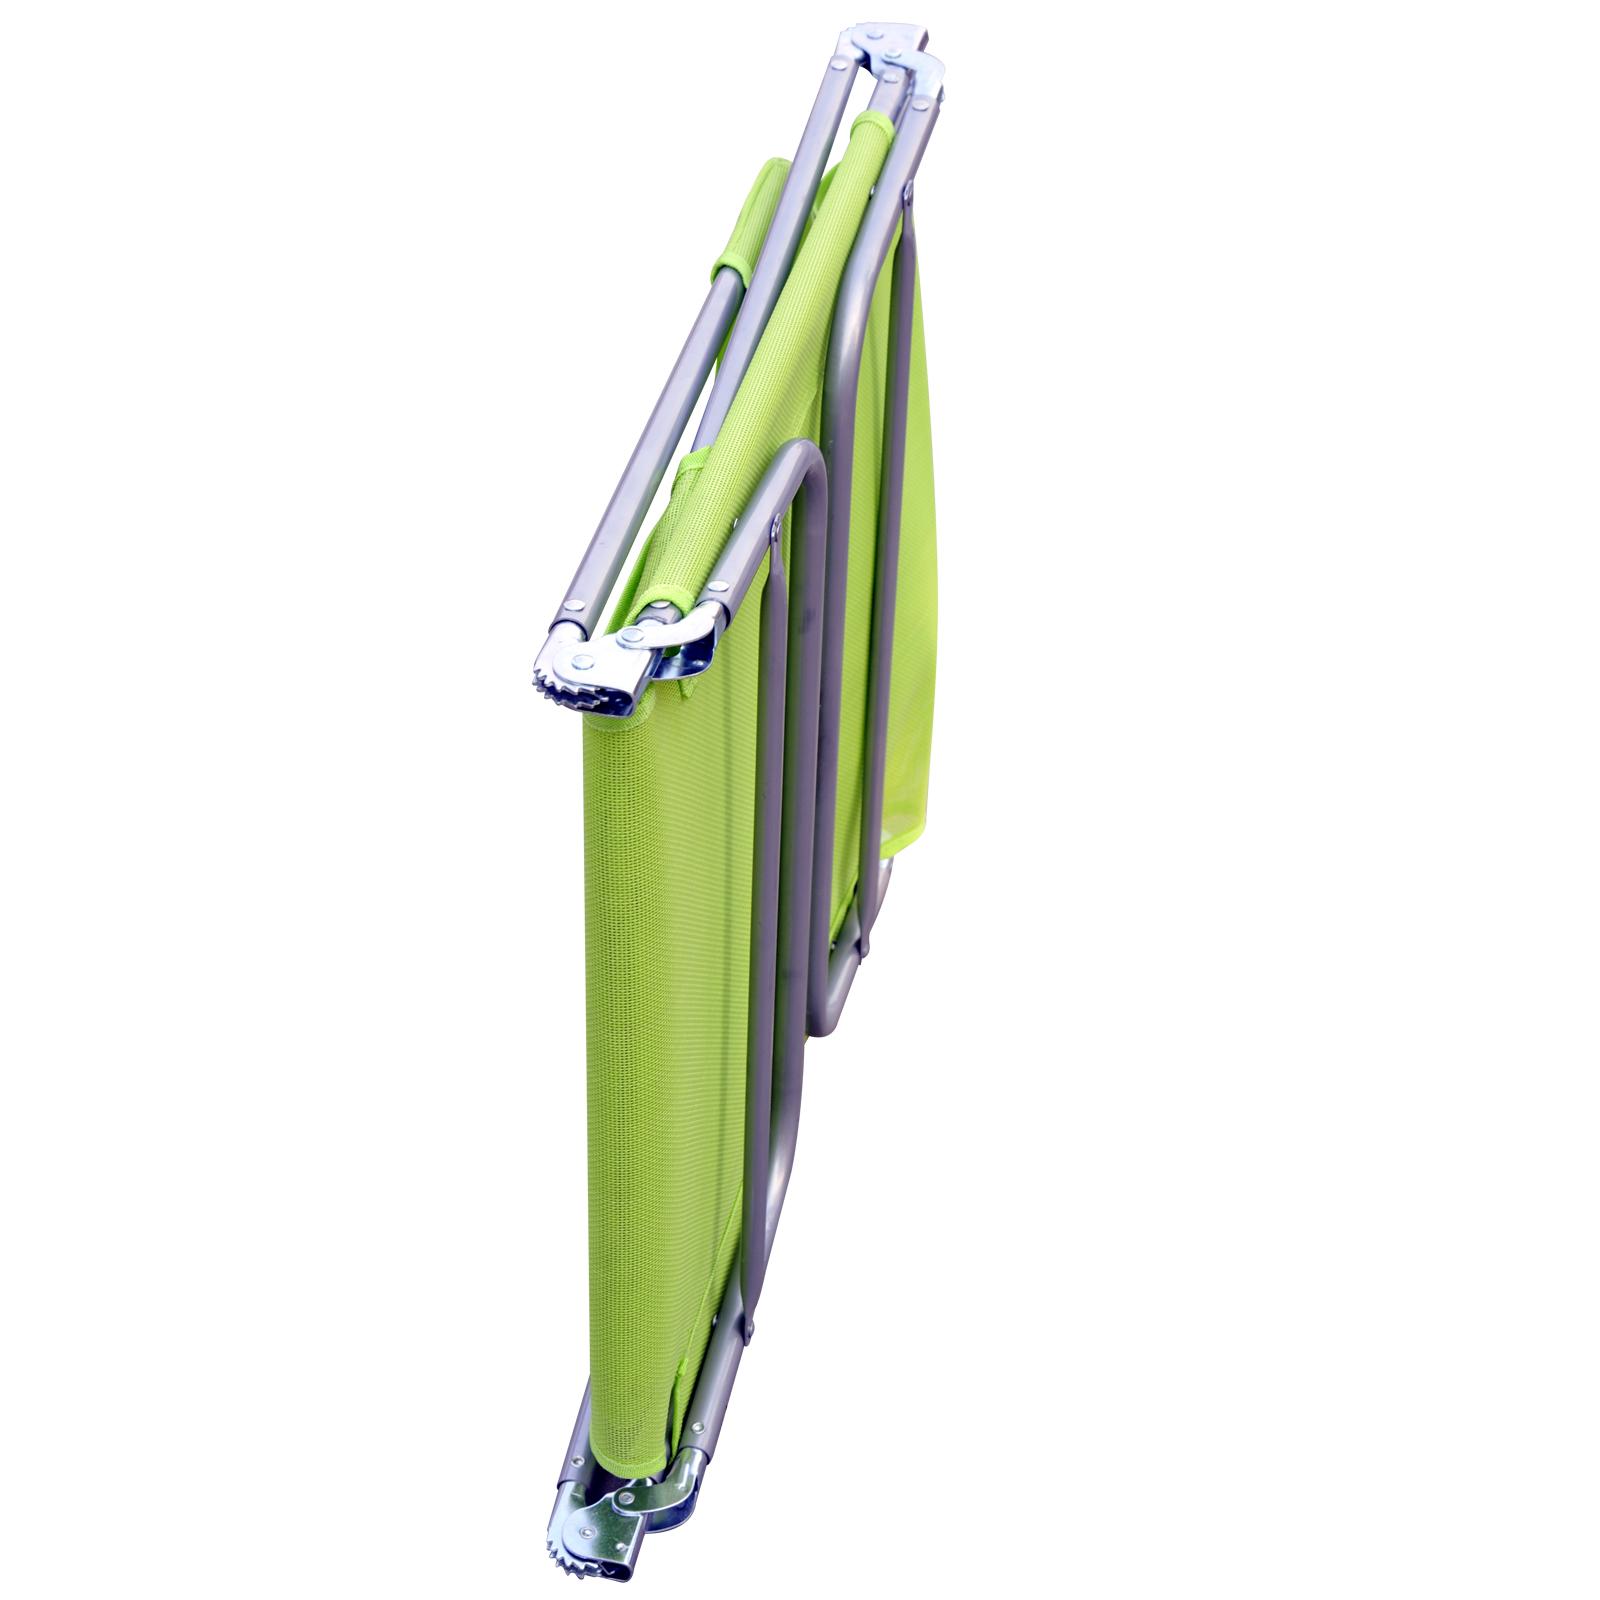 01 0335g(7) - Tumbona Inclinable de Acero Plegable con Almohada Playa Piscina Varios Colores